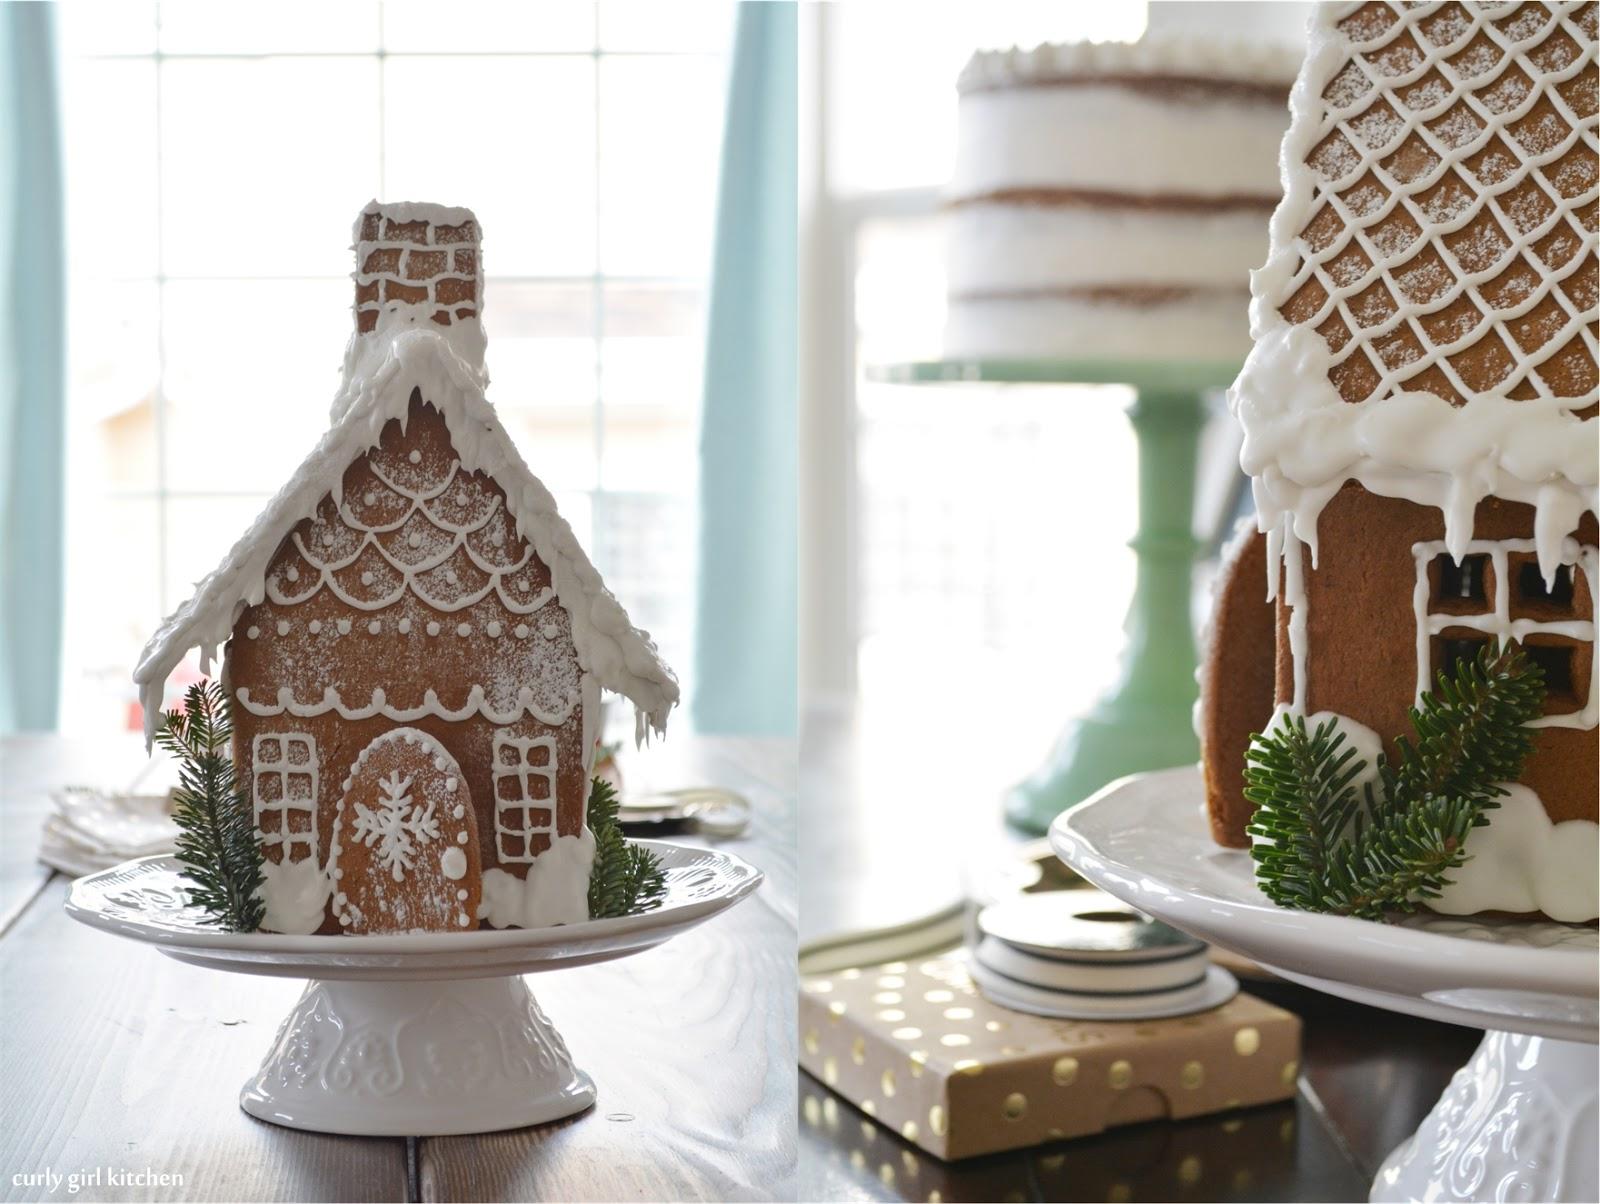 Curly Girl Kitchen: A Gingerbread House, Rum Raisin Apple Butter ...